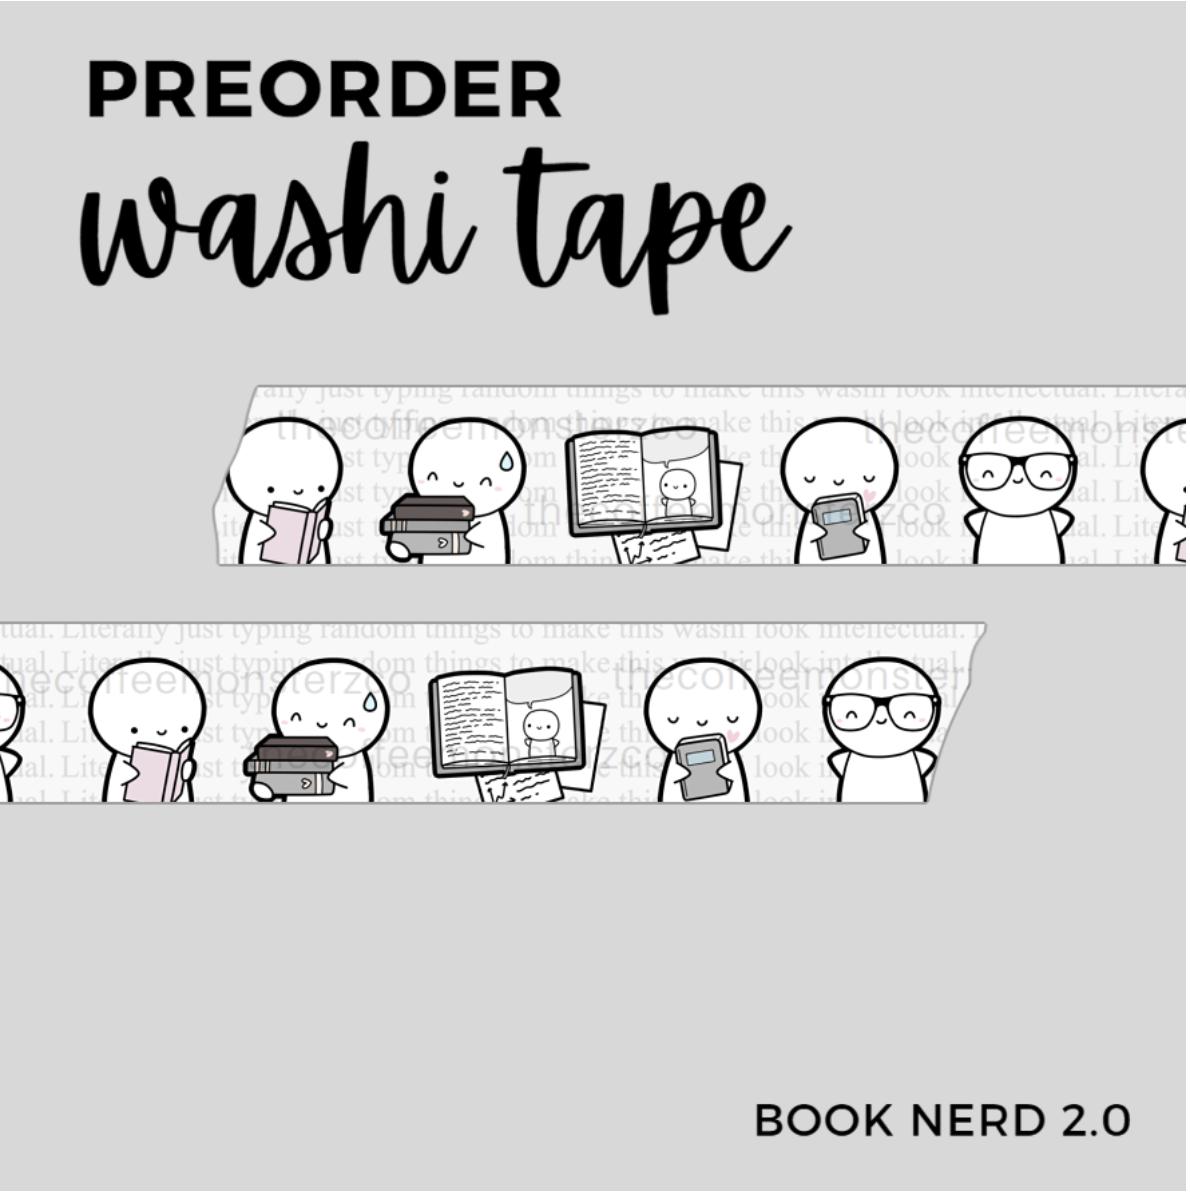 THECOFFEEMONSTERZCO | BOOK NERD 2.0 | WASHI  15MM